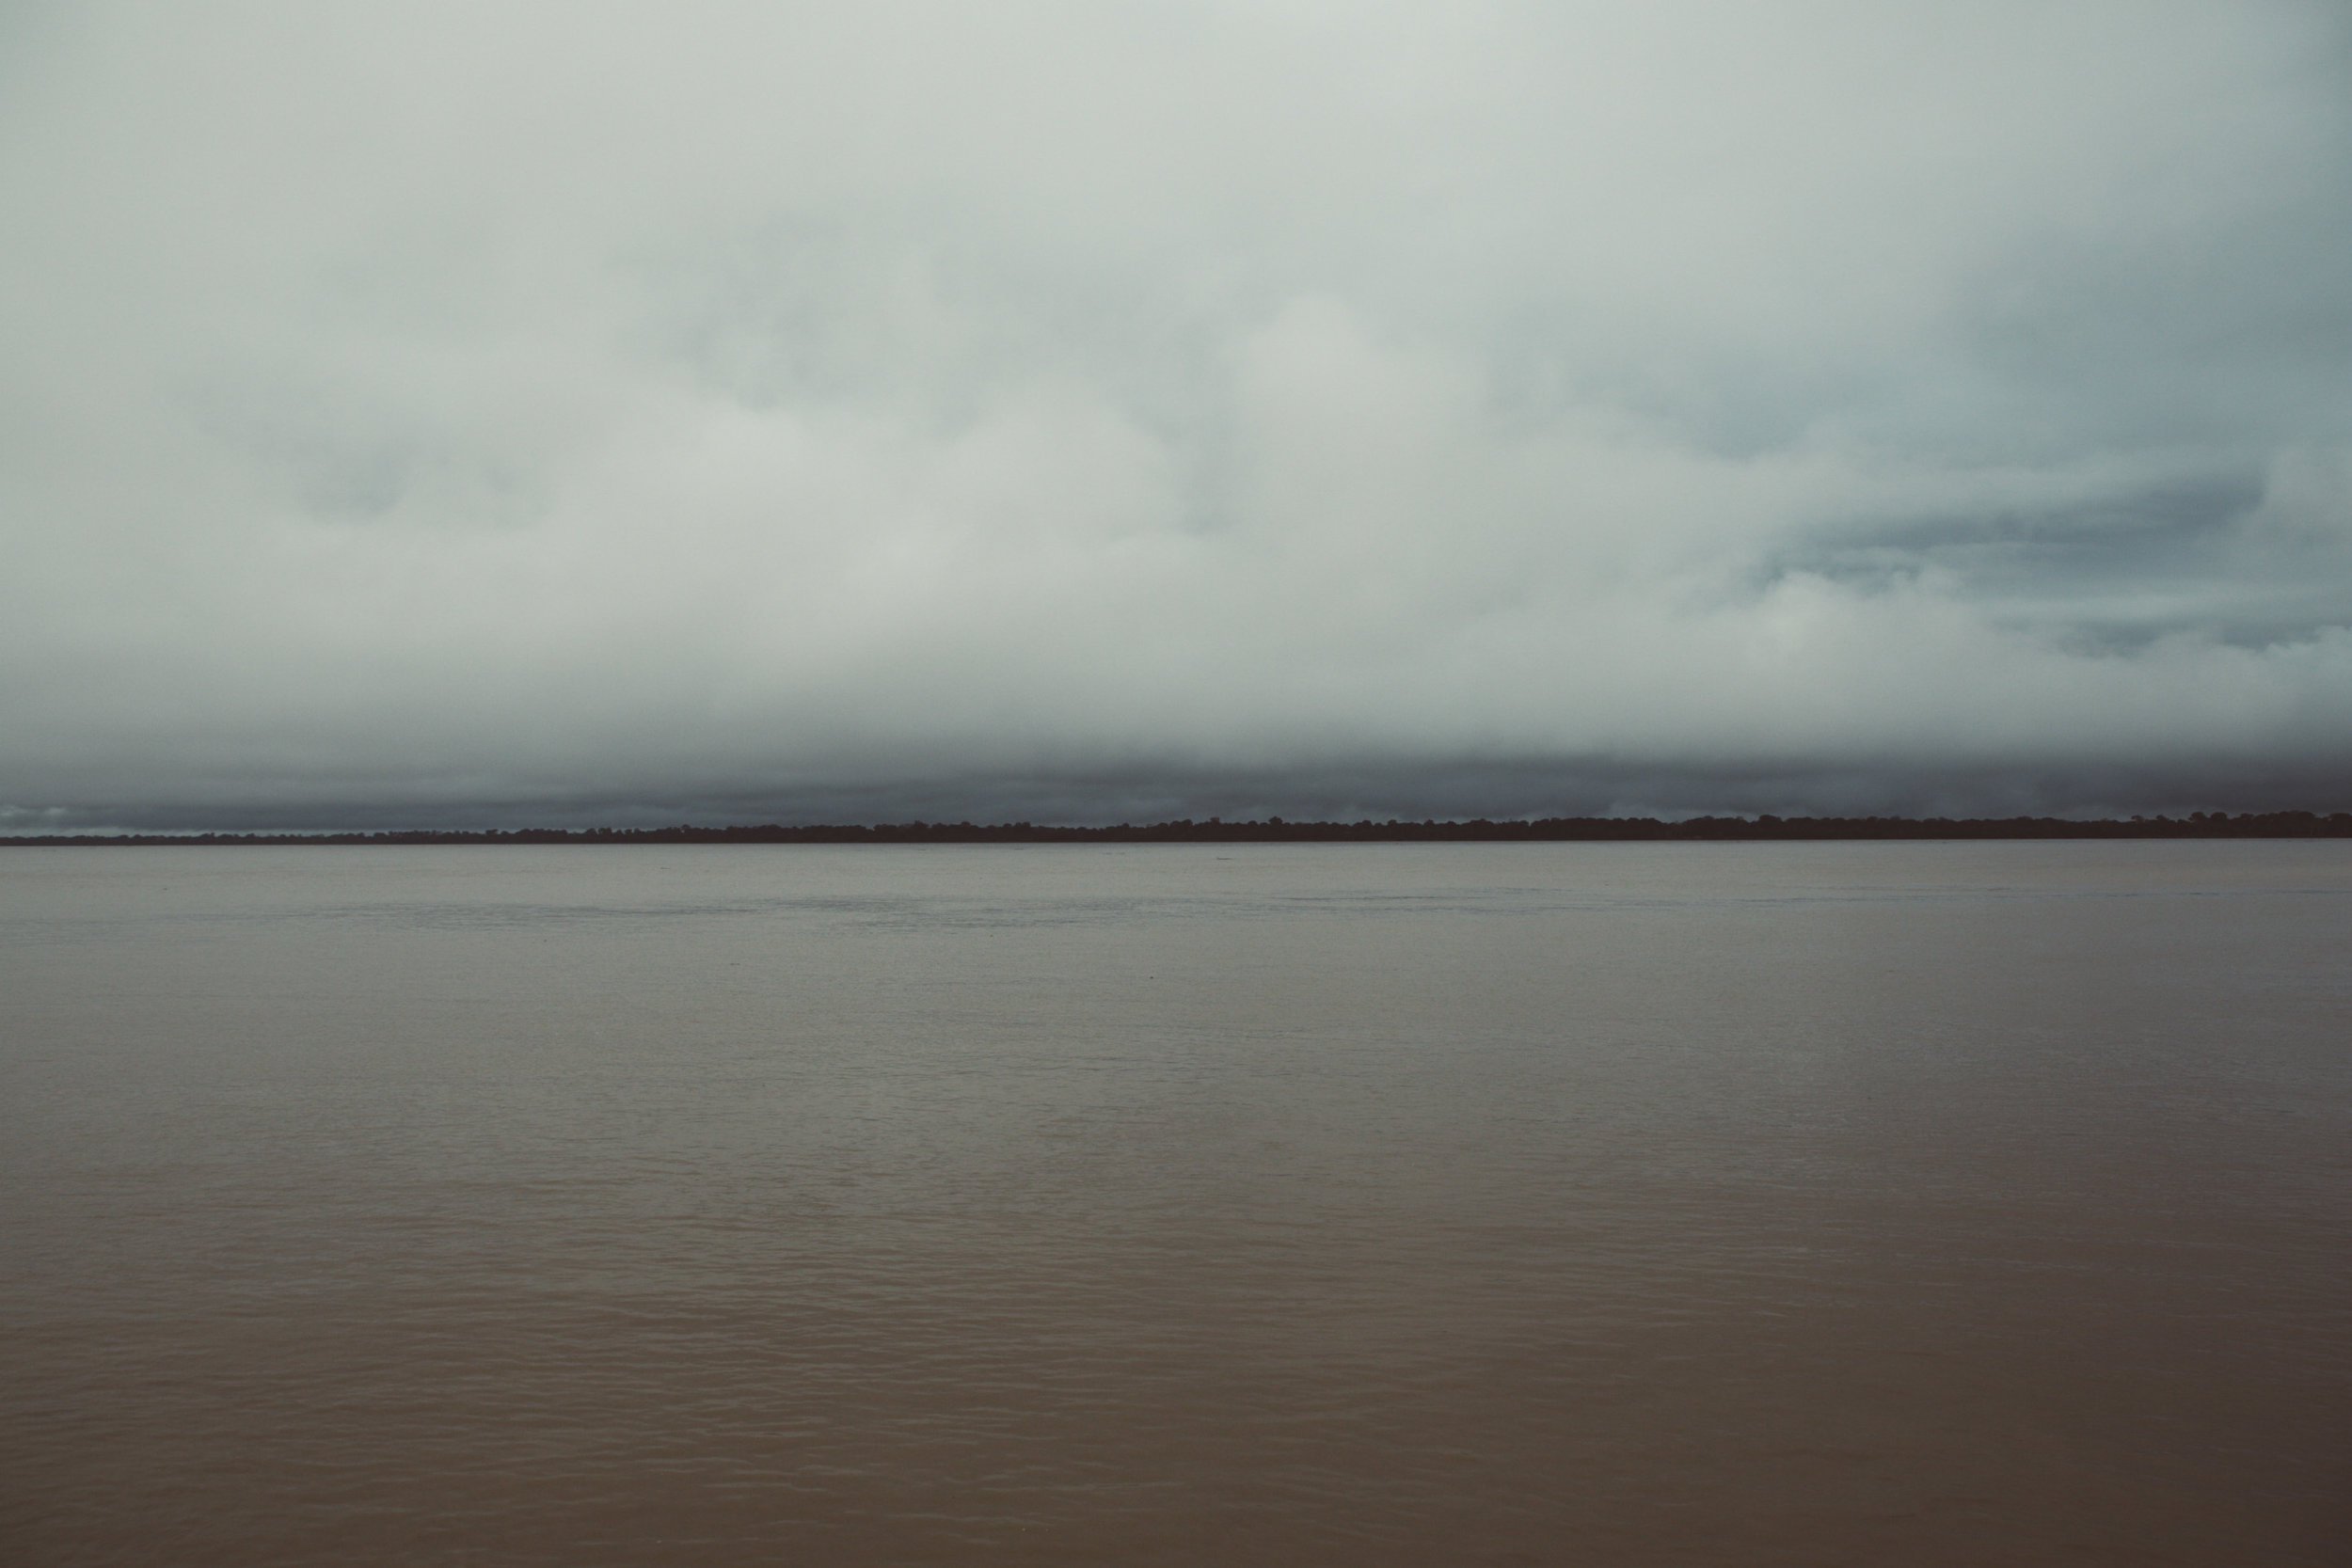 Amazonas_poem-1.jpg